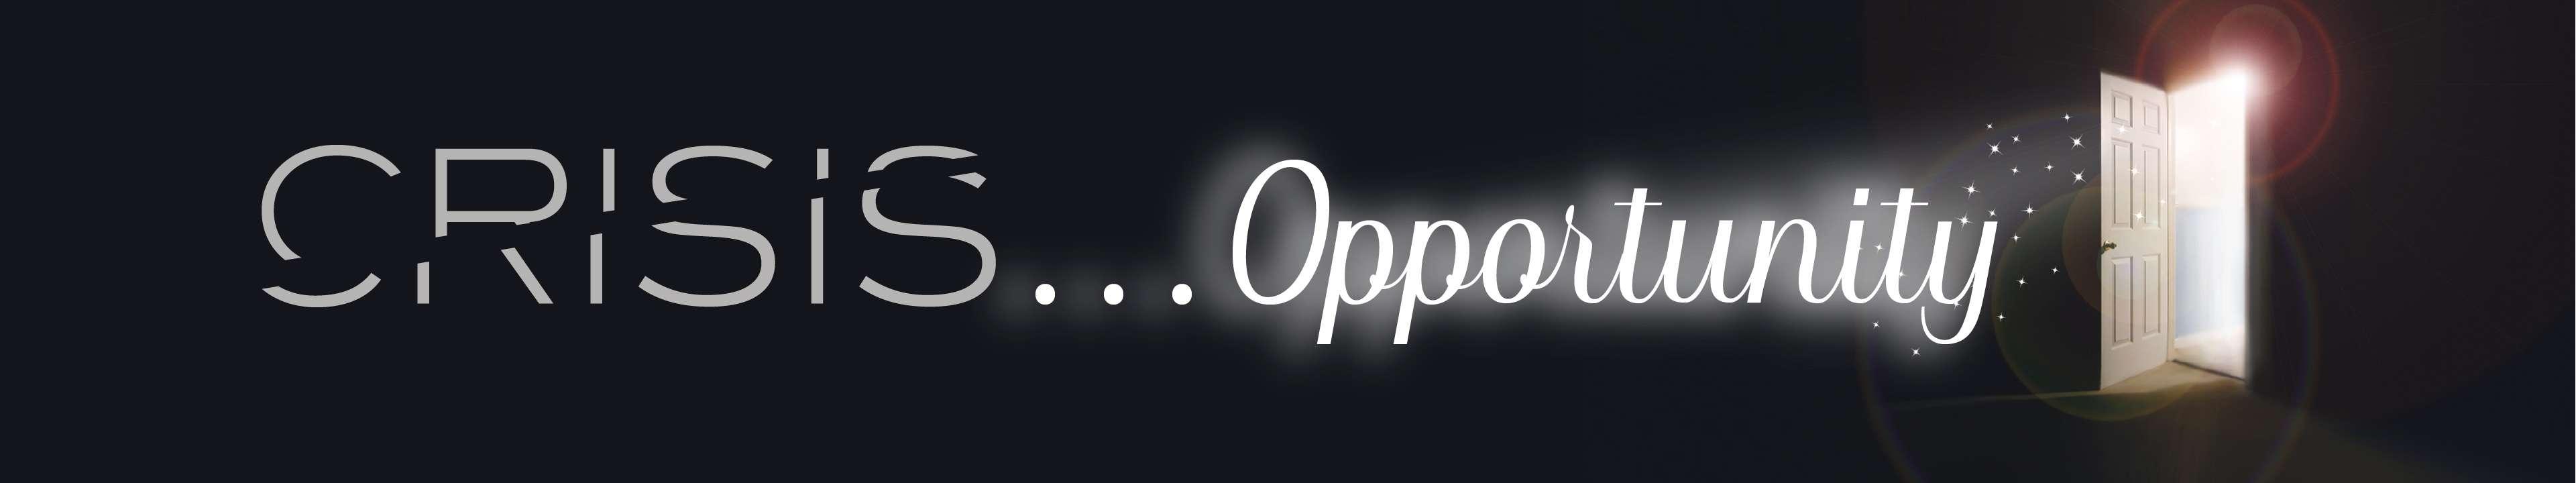 crisis-opportunity-10brd-dq2020-slim-banne2r2x-100